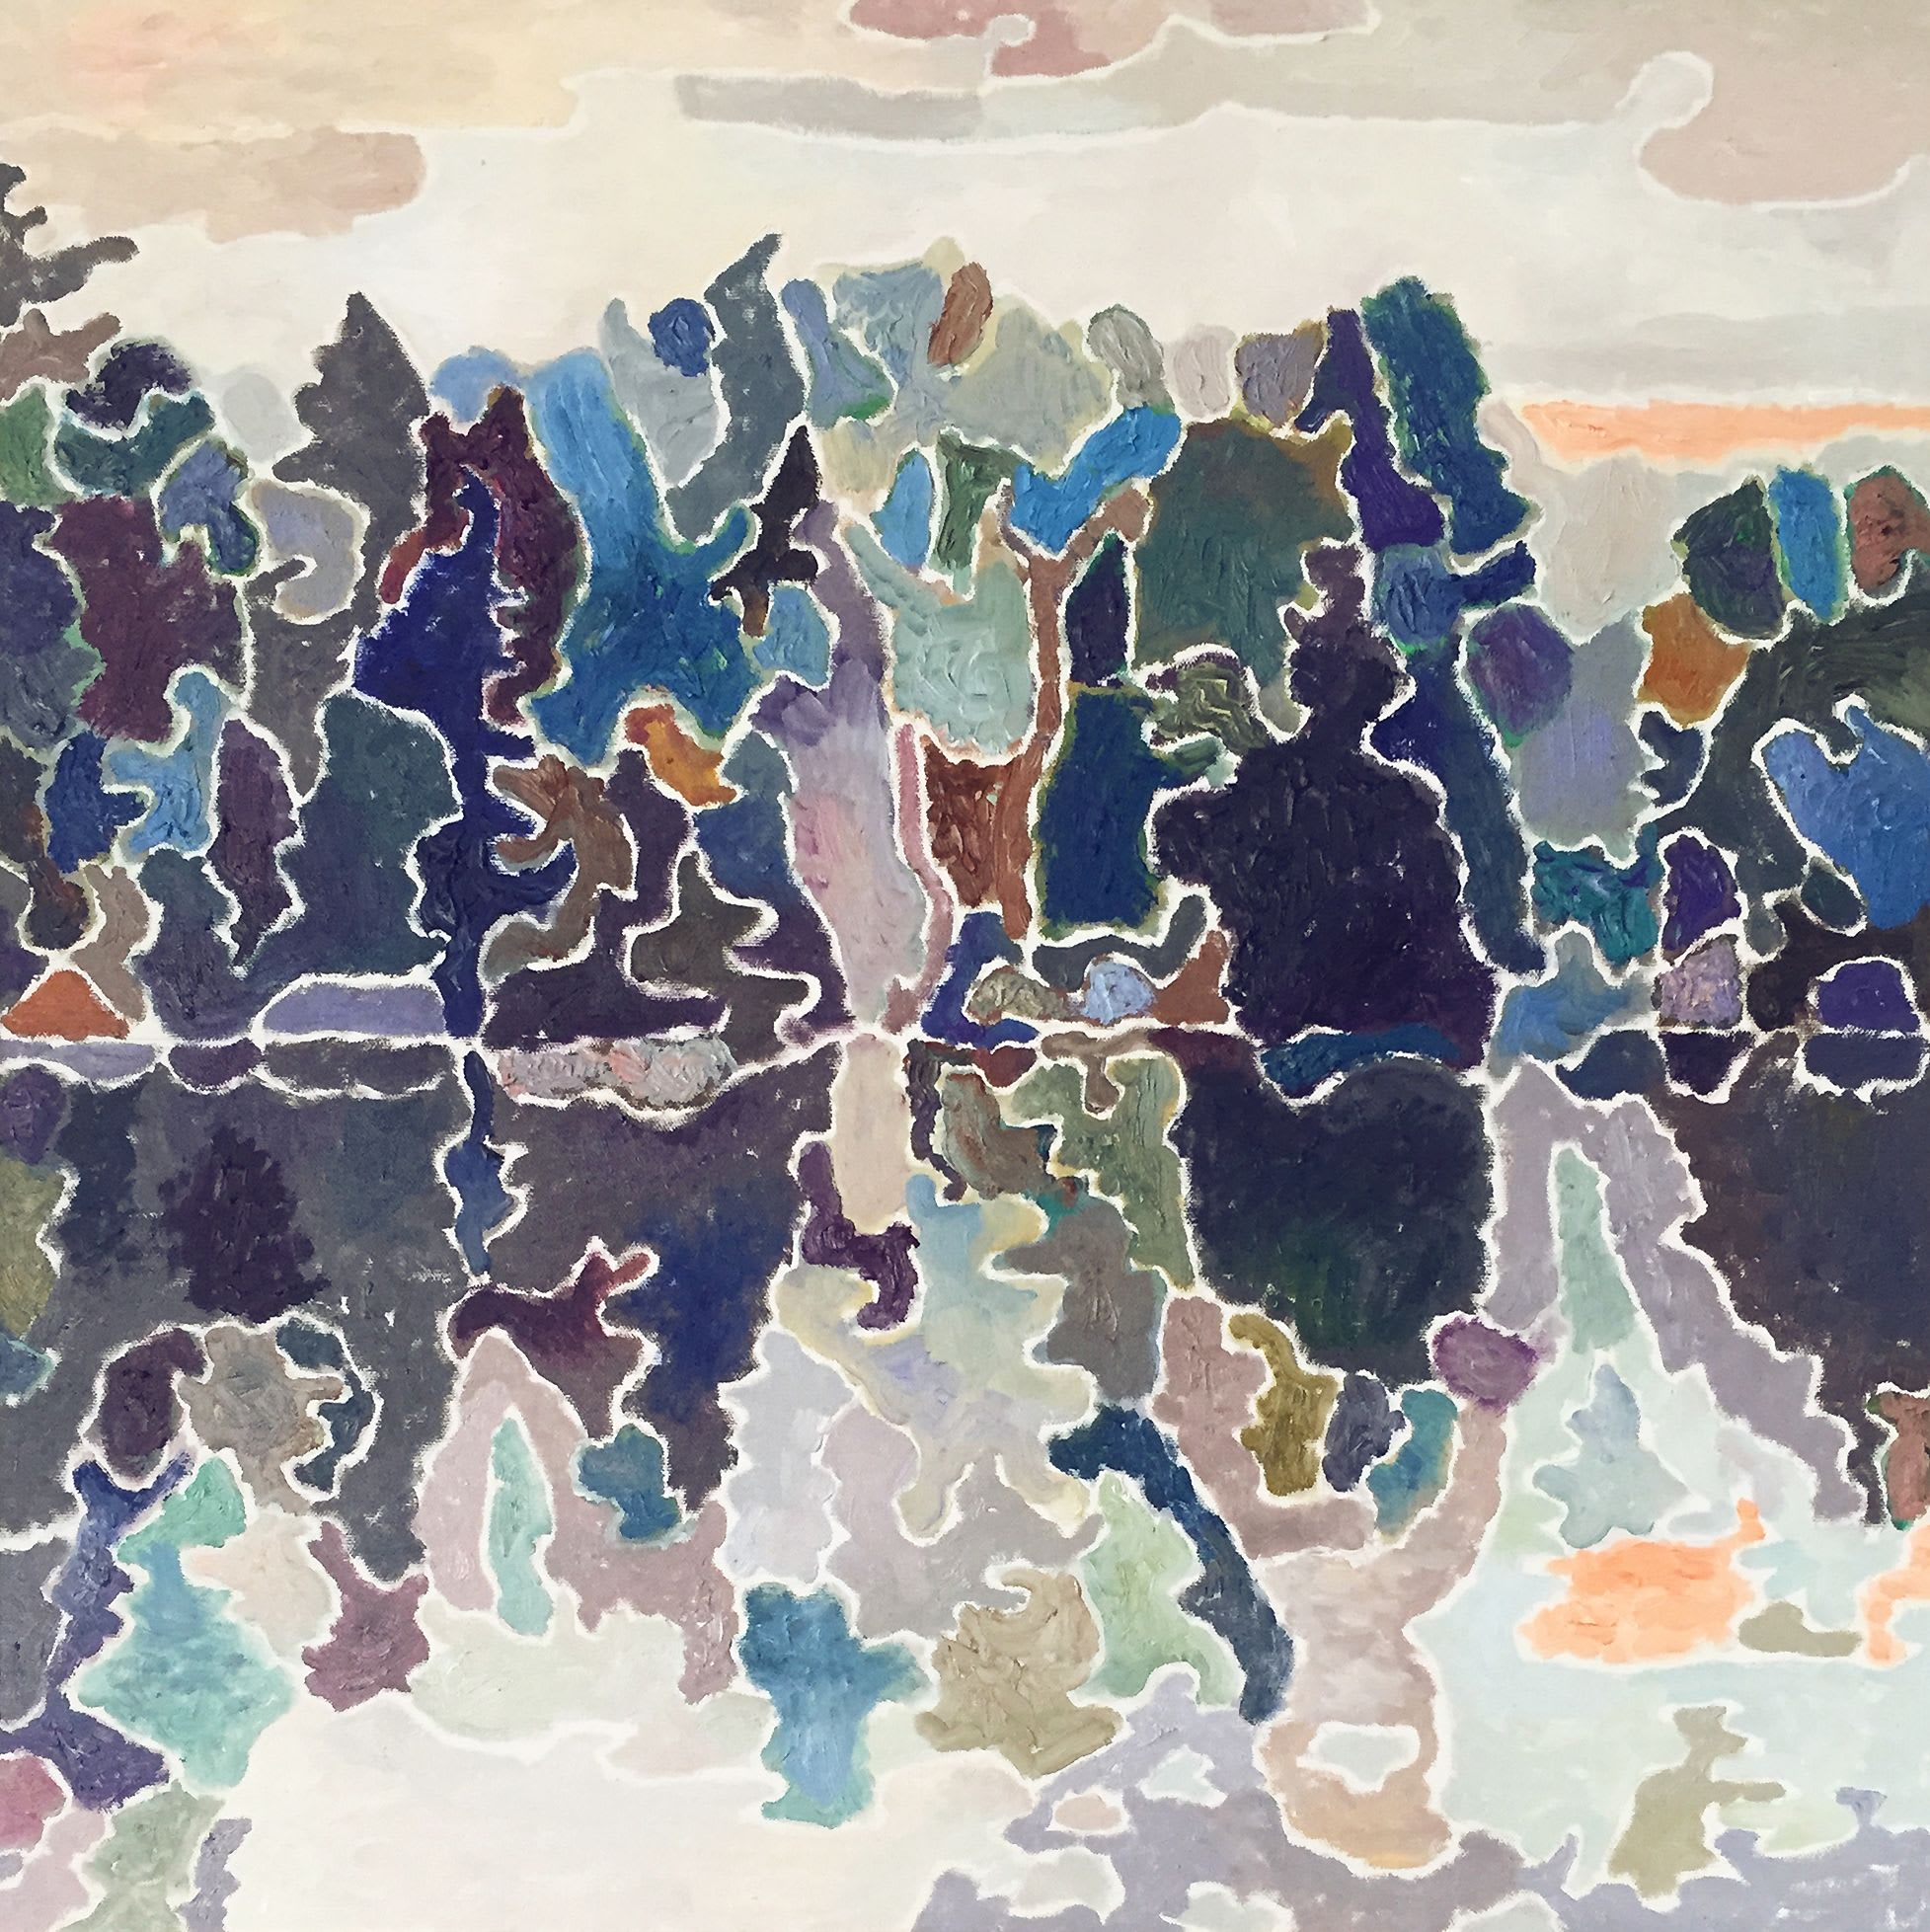 'Kilarney D' by Orlin Mantchev at Gallery 133